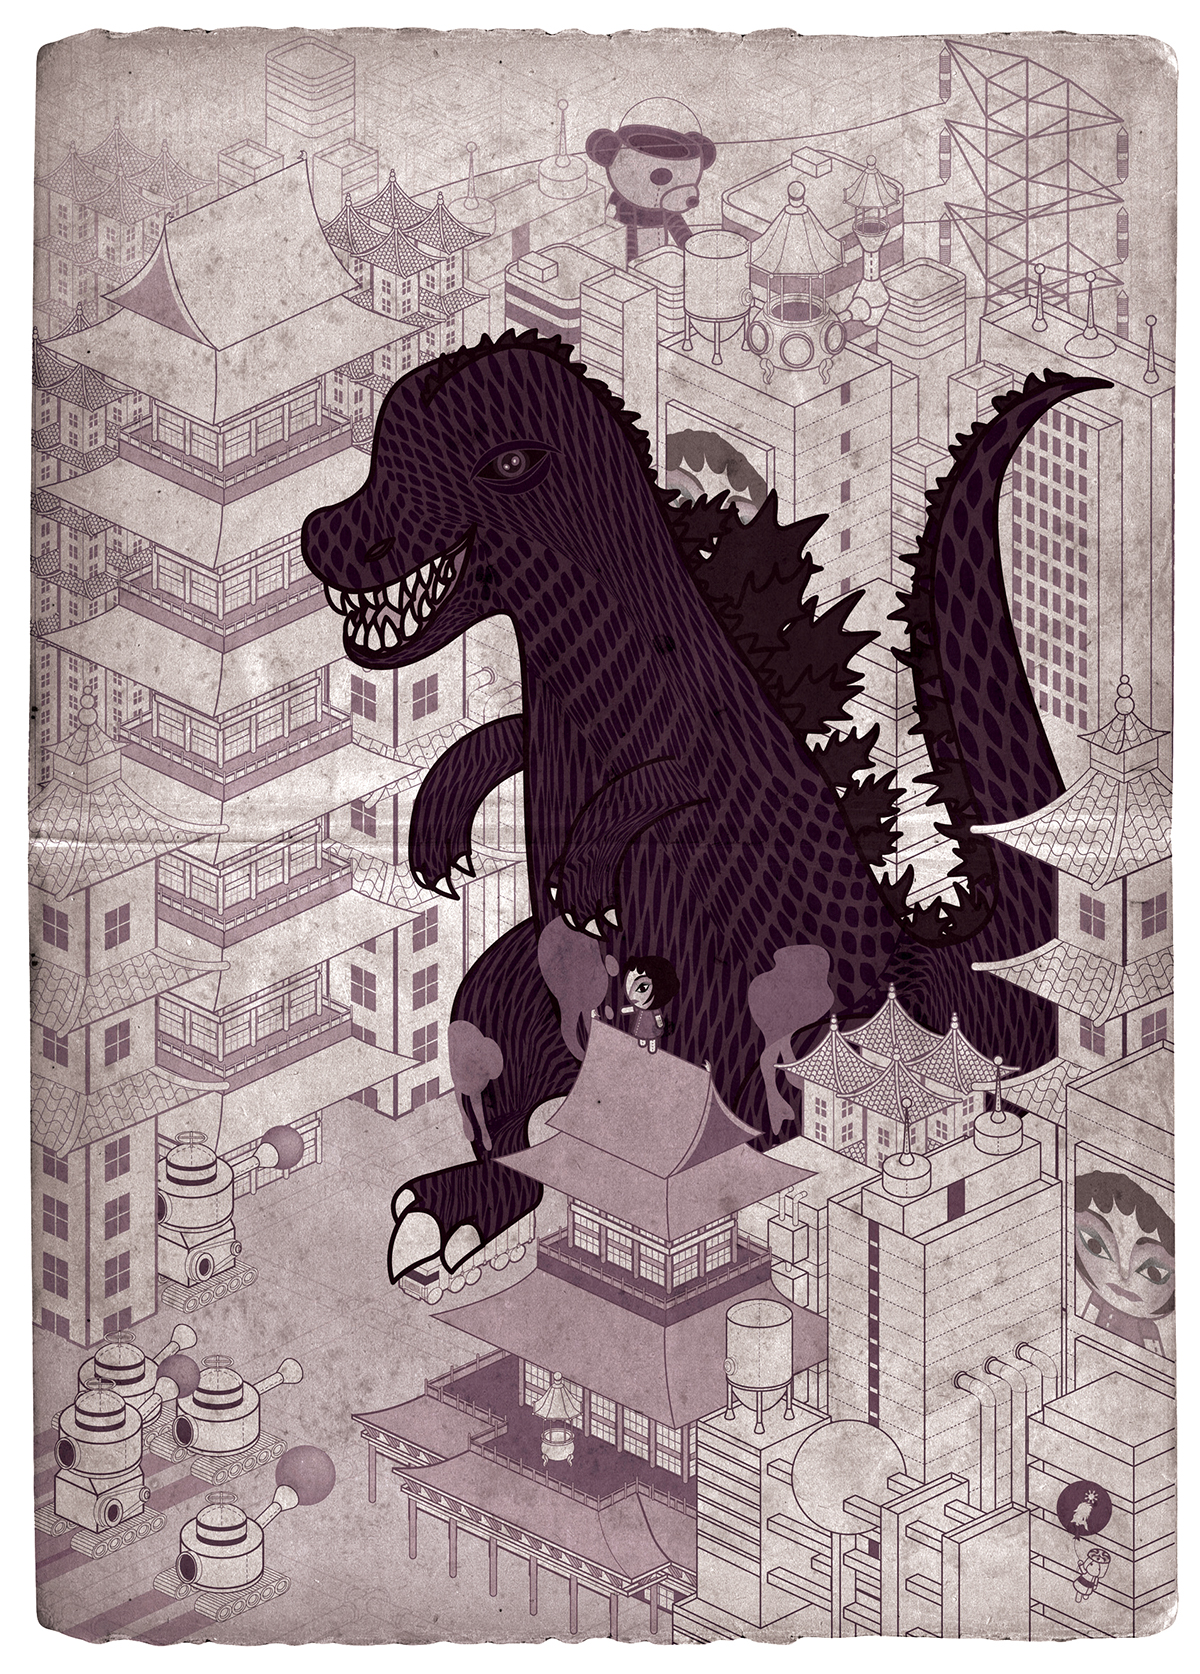 godzilla King Kong kaiju monsters japan buildings cityscapes movie posters